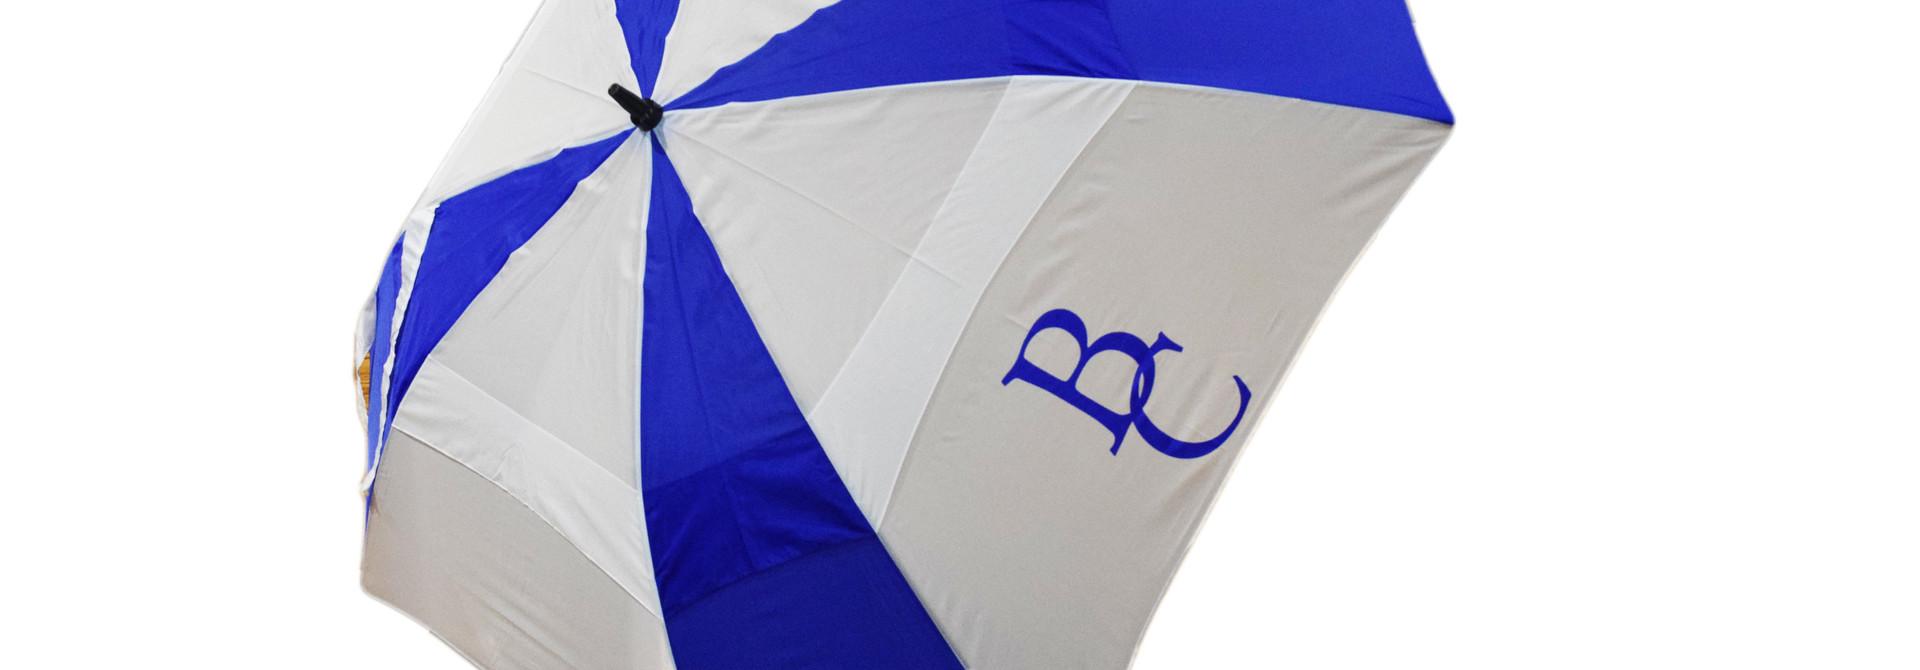 Blue and  White Golf BC Umbrella